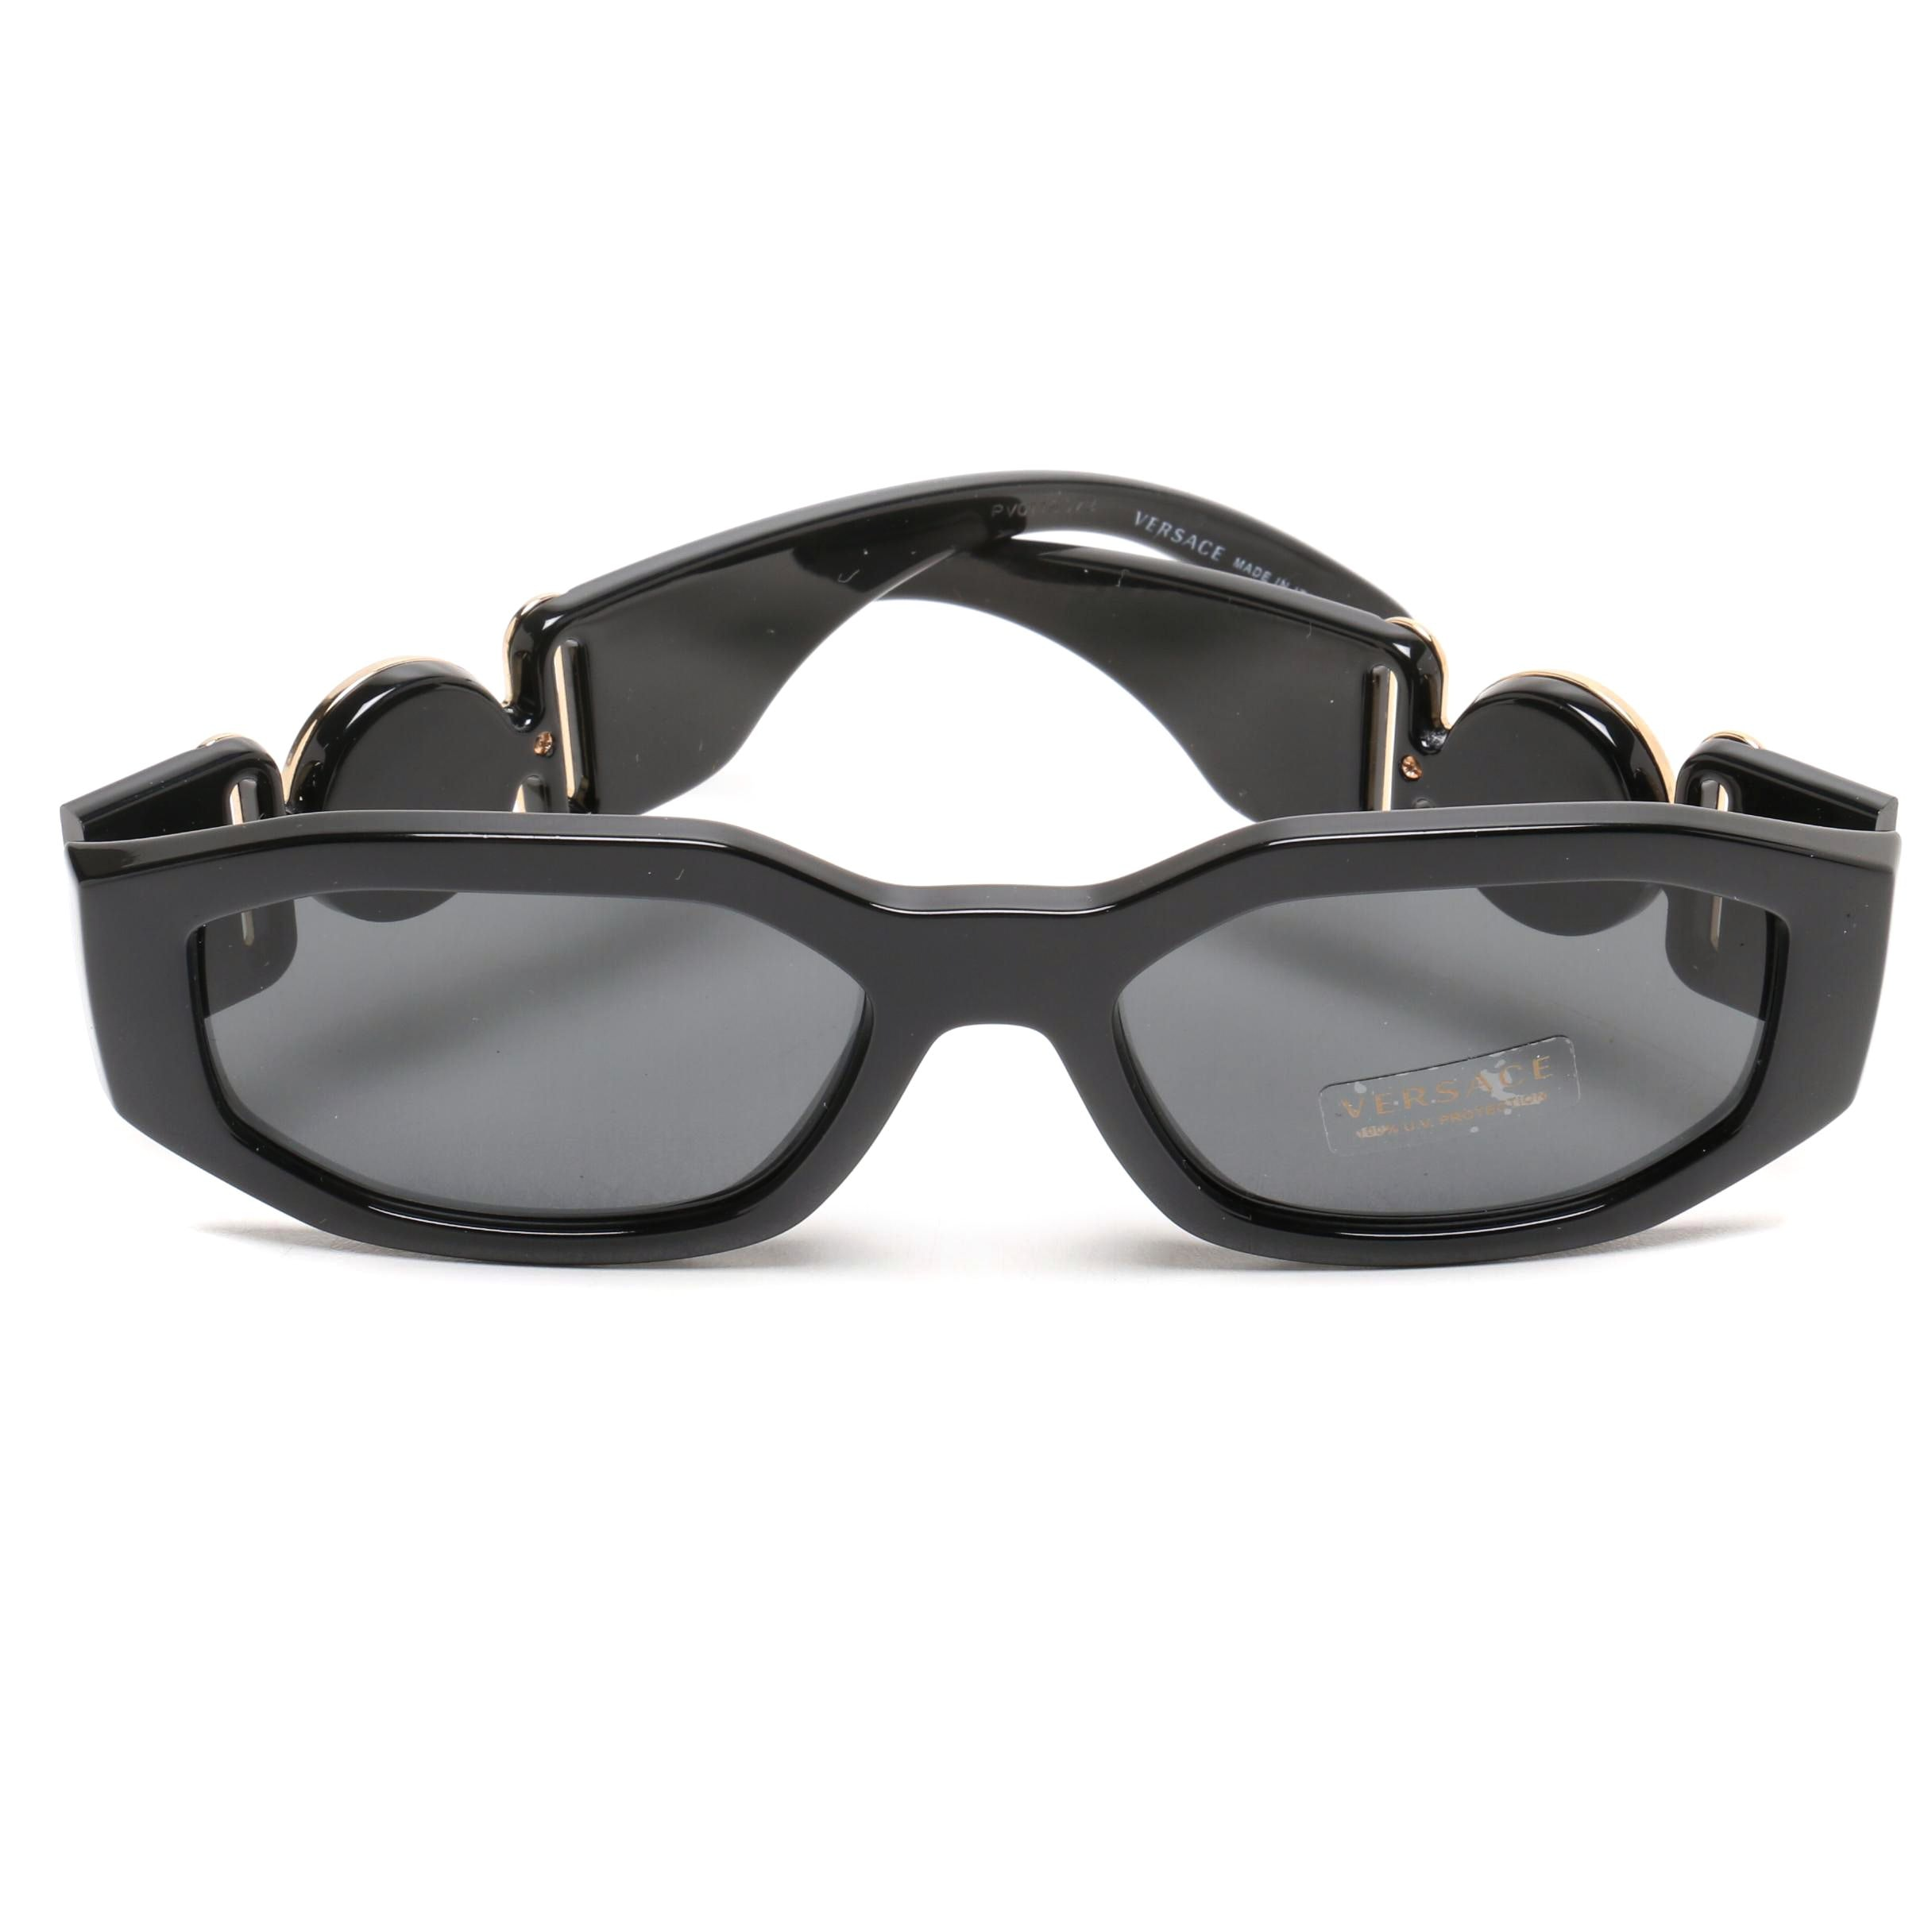 Versace Medusa Accented Black Sunglasses